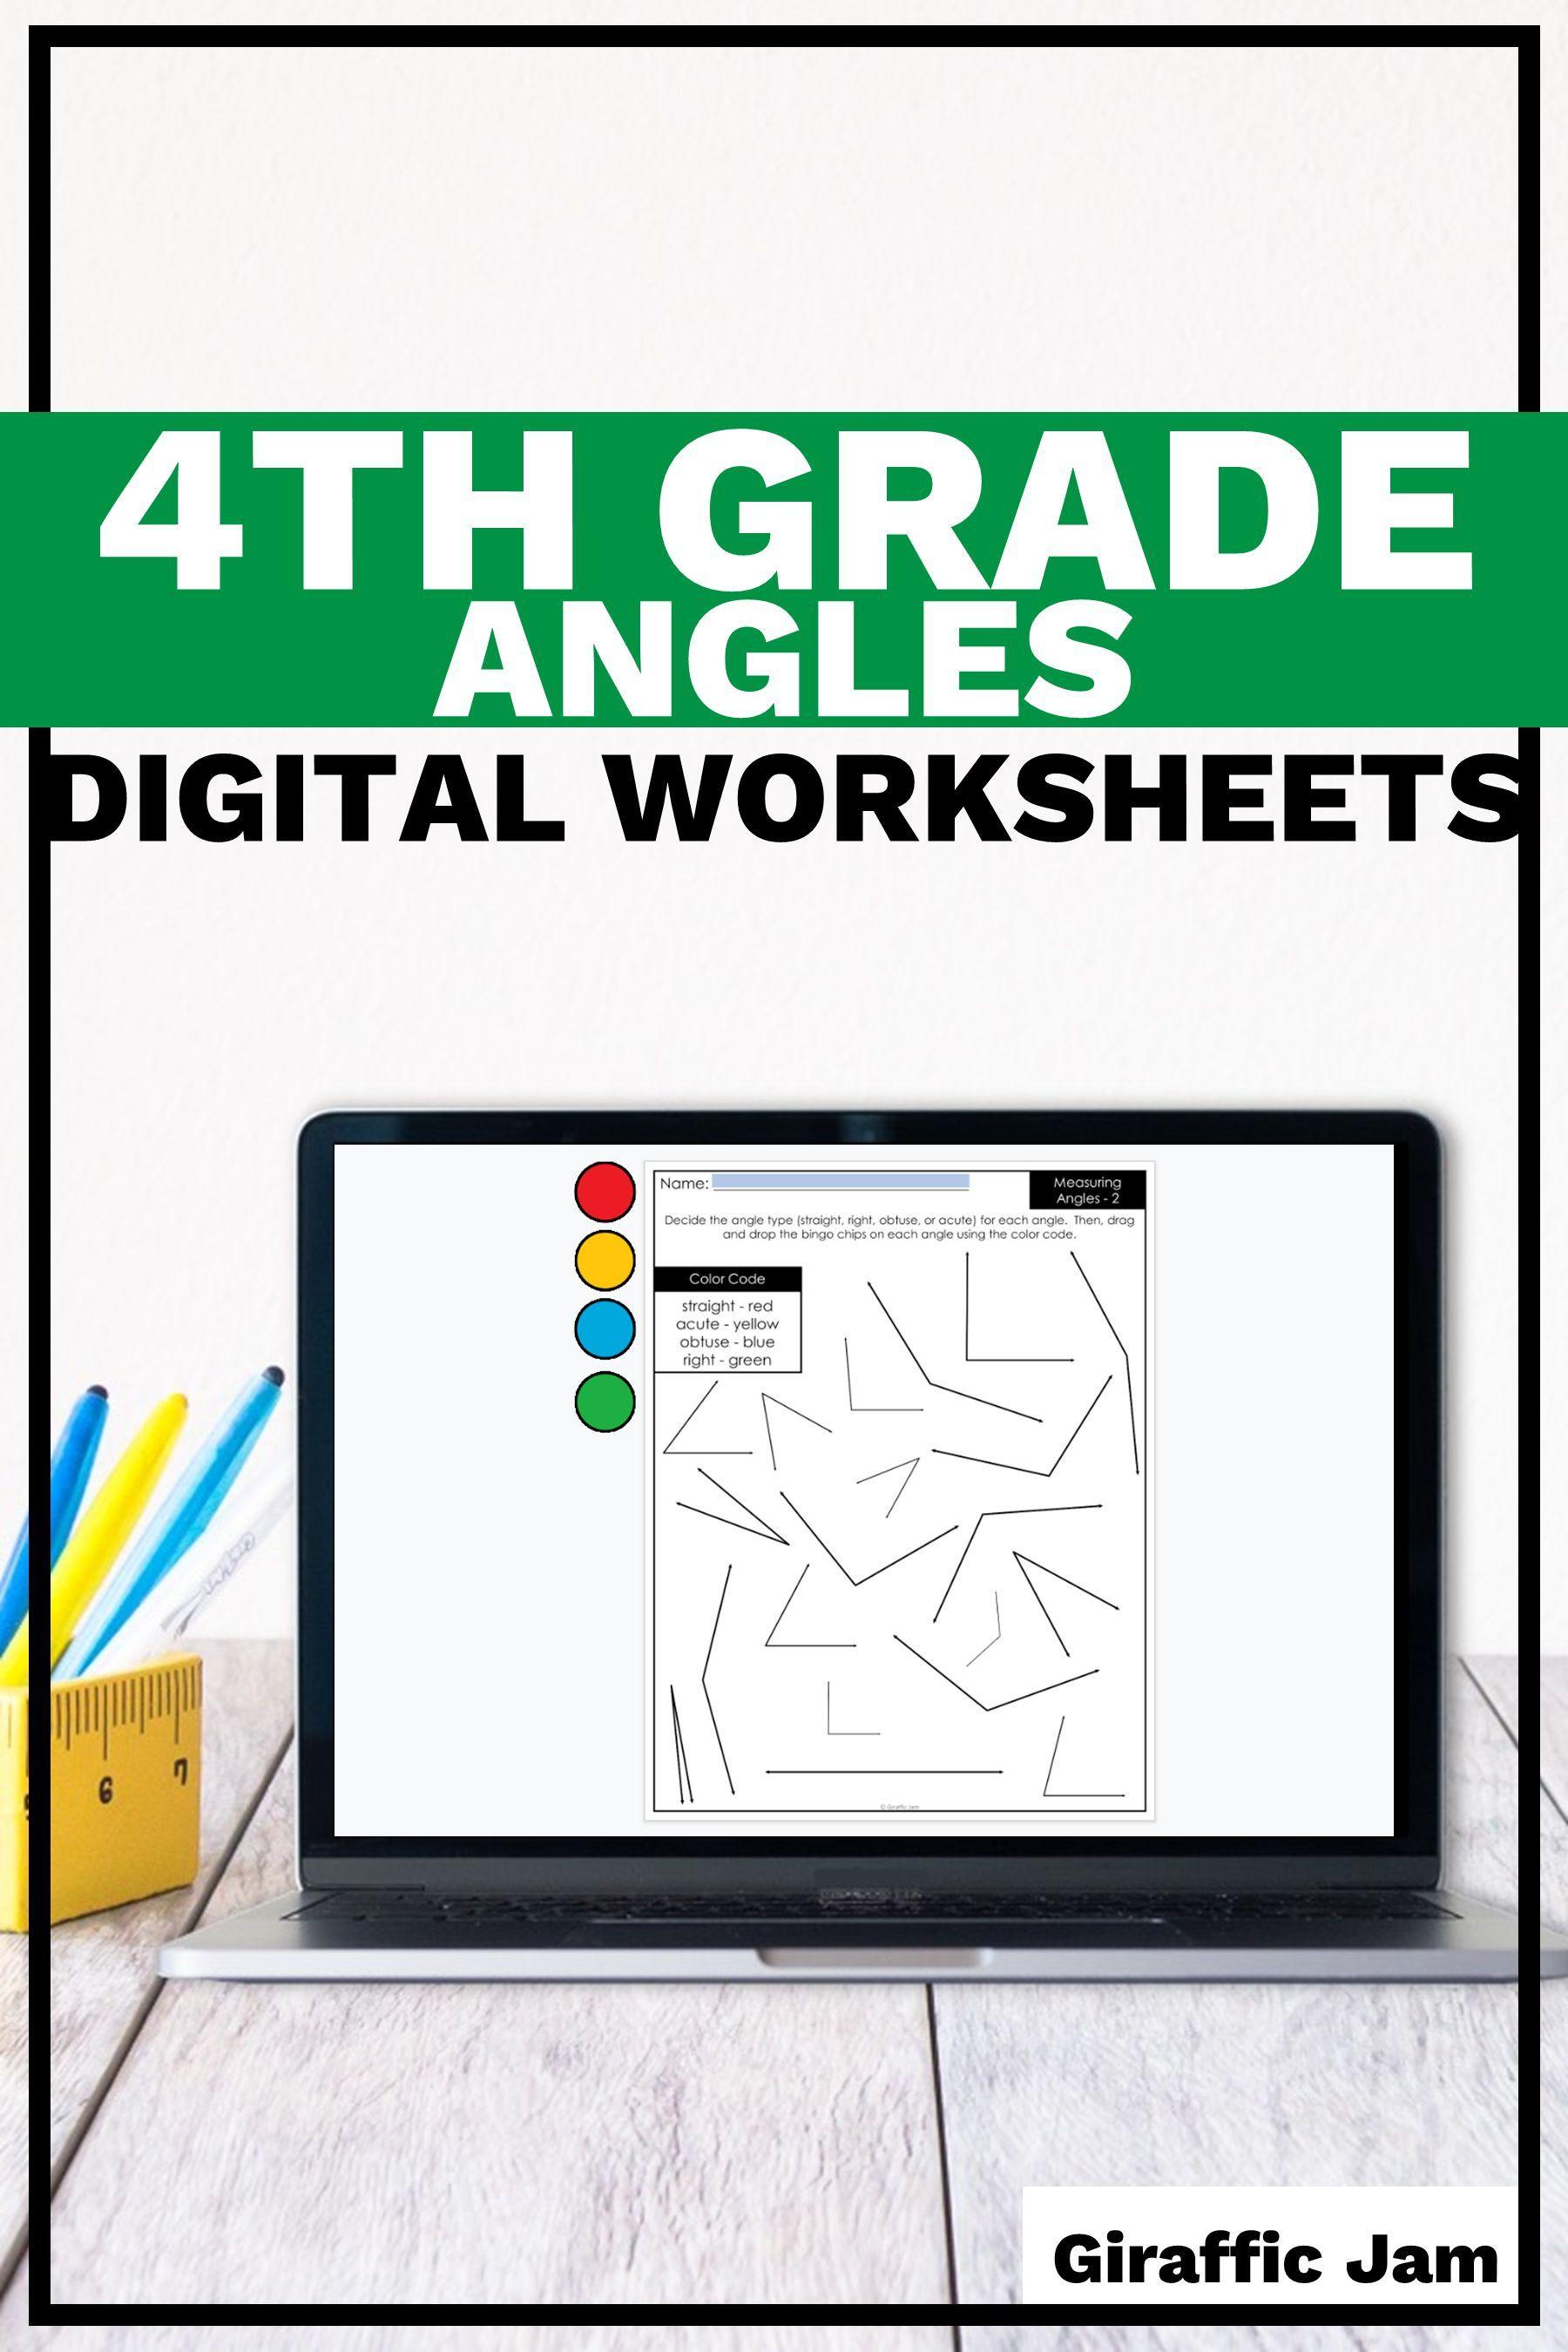 4th Grade Measurement Measurement Worksheets Angles Measuring Angles Digital Worksheets Measurement Worksheets Google Classroom Measurement Activities [ 2700 x 1800 Pixel ]